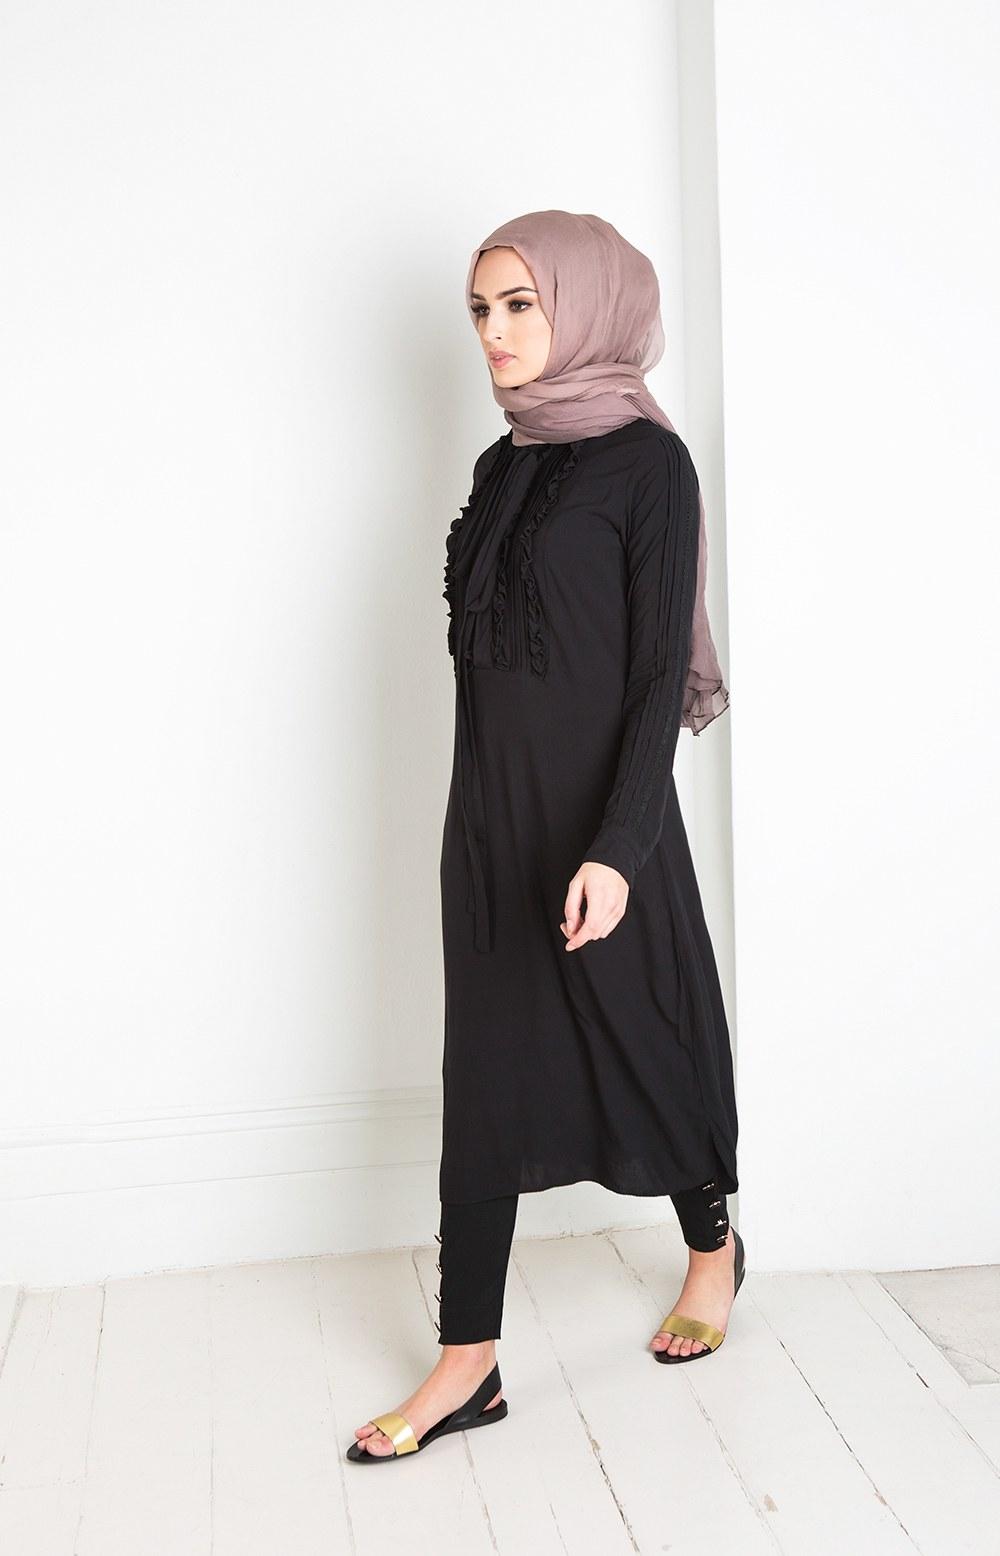 Inspirasi Model Model Baju Lebaran Dwdk 25 Trend Model Baju Muslim Lebaran 2018 Simple & Modis